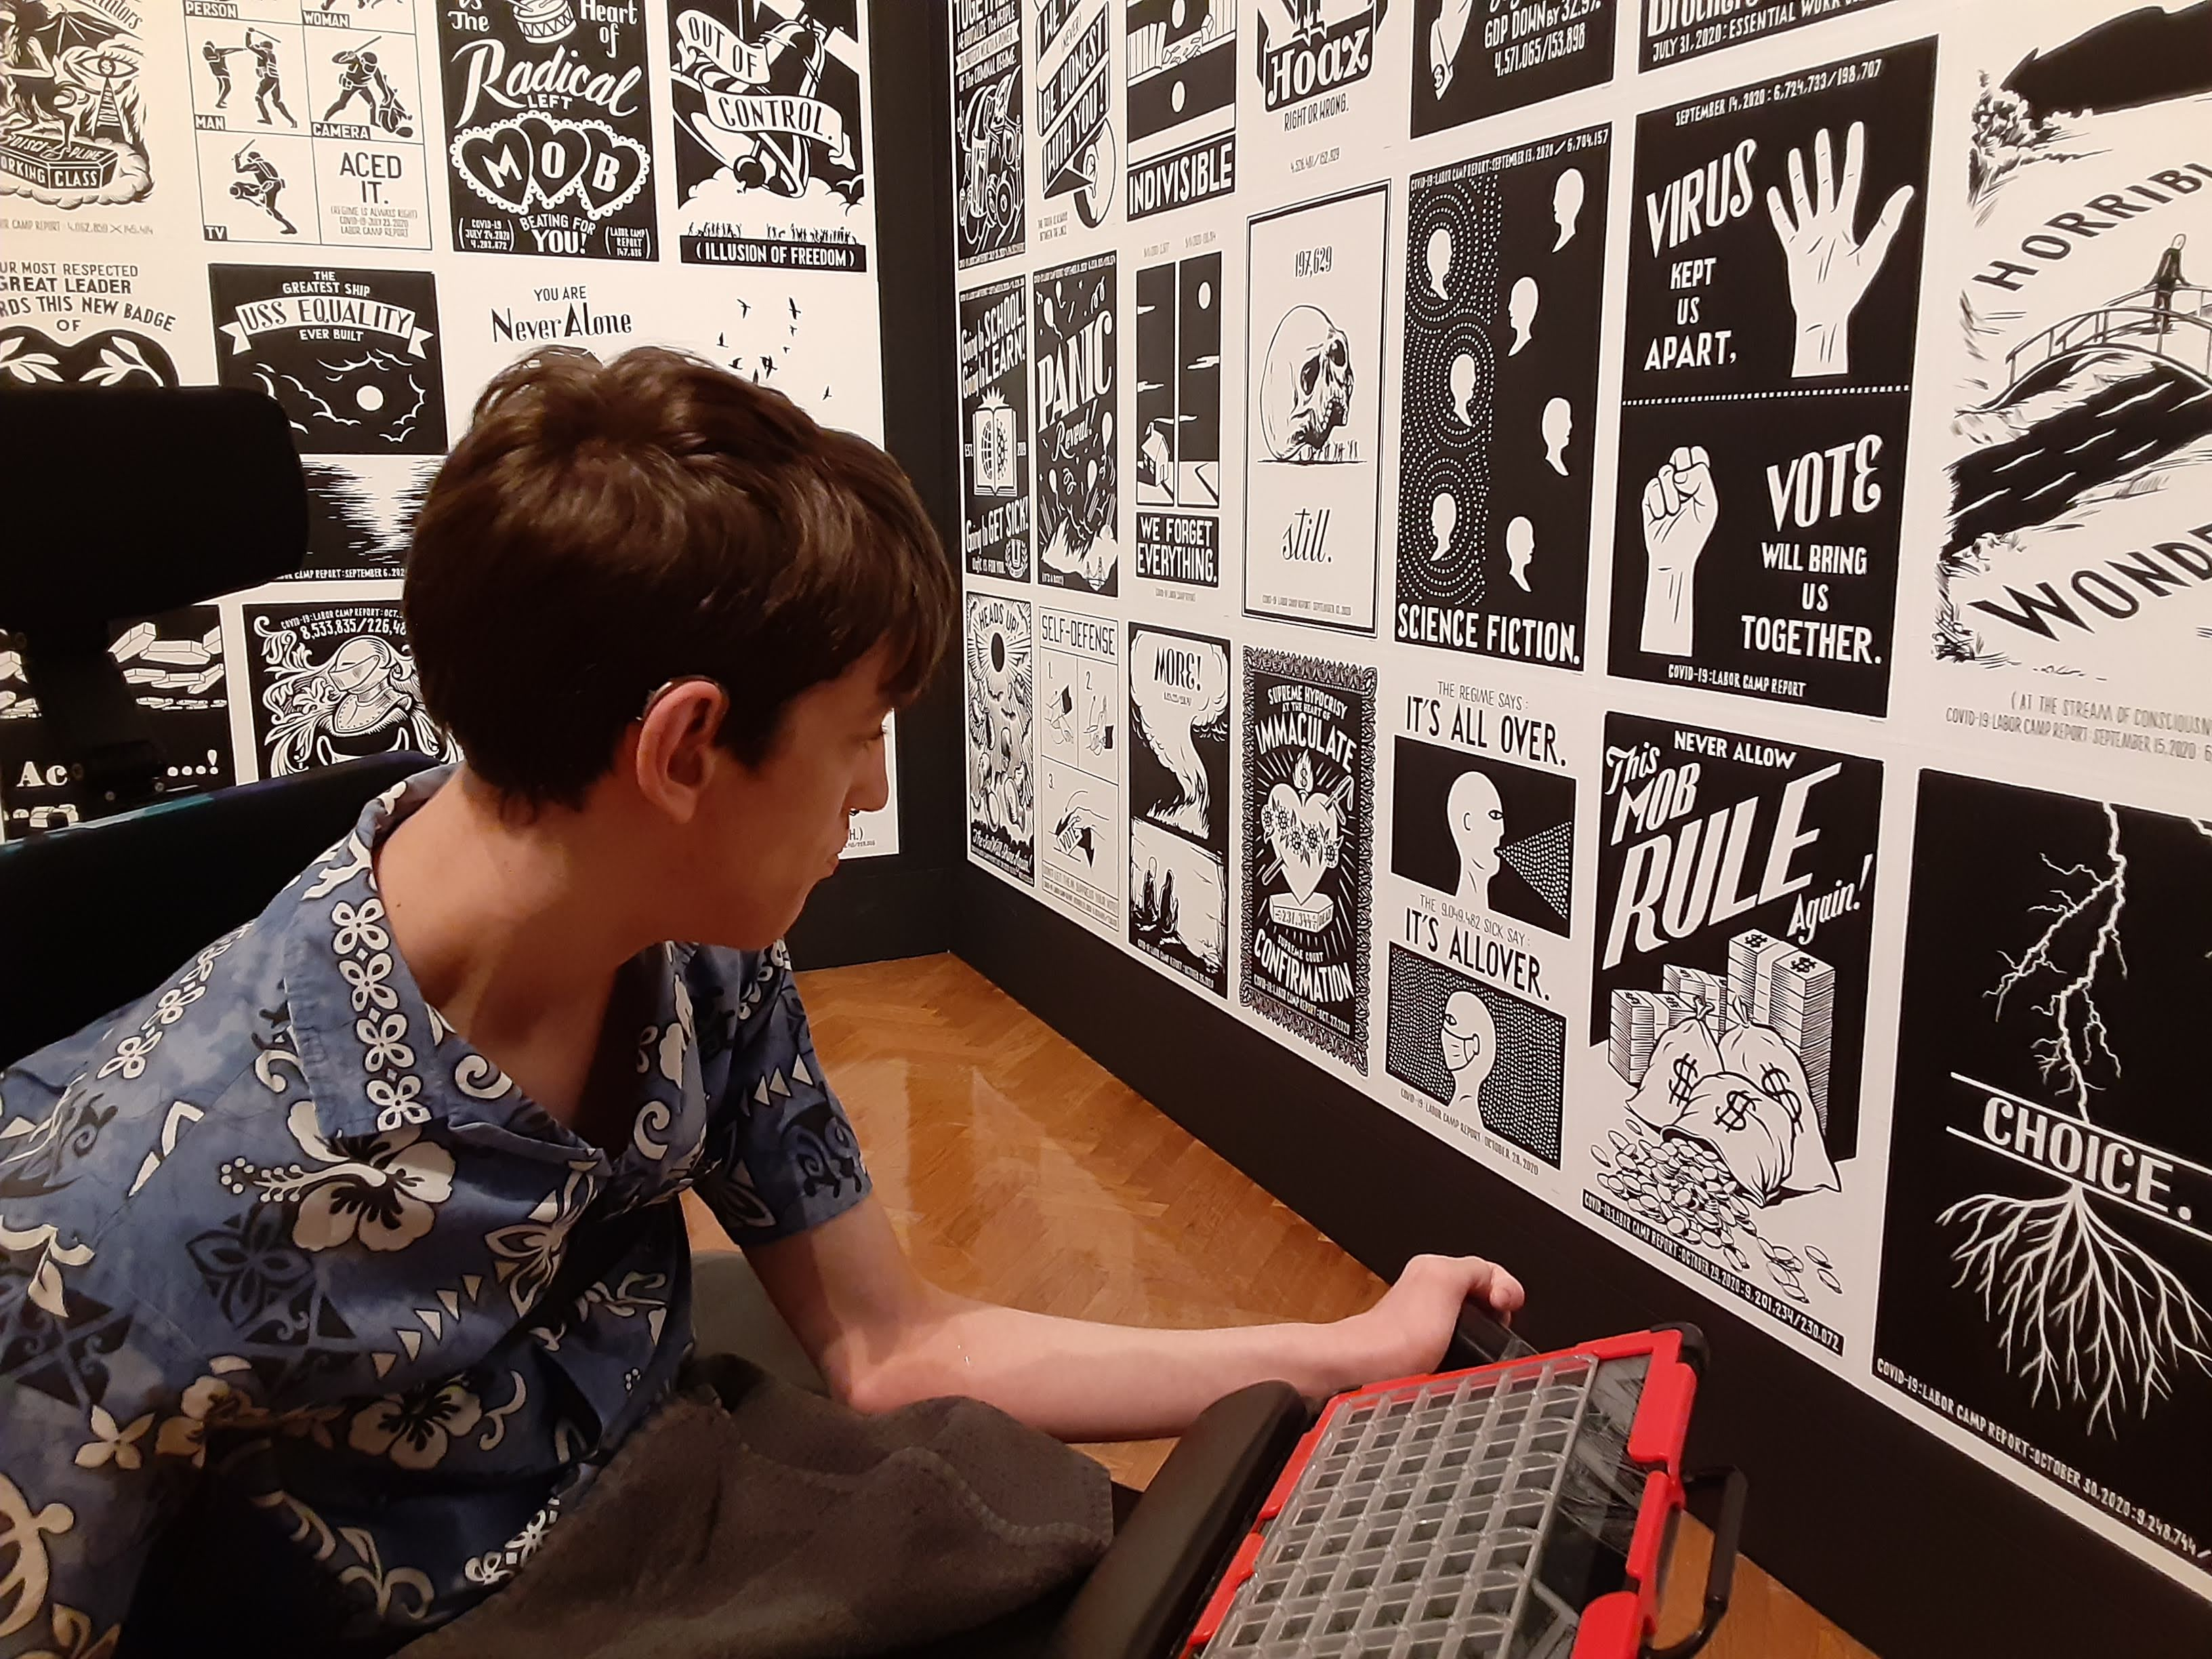 Justin looking at Piotr Szyhalski art exhibit black and white prints